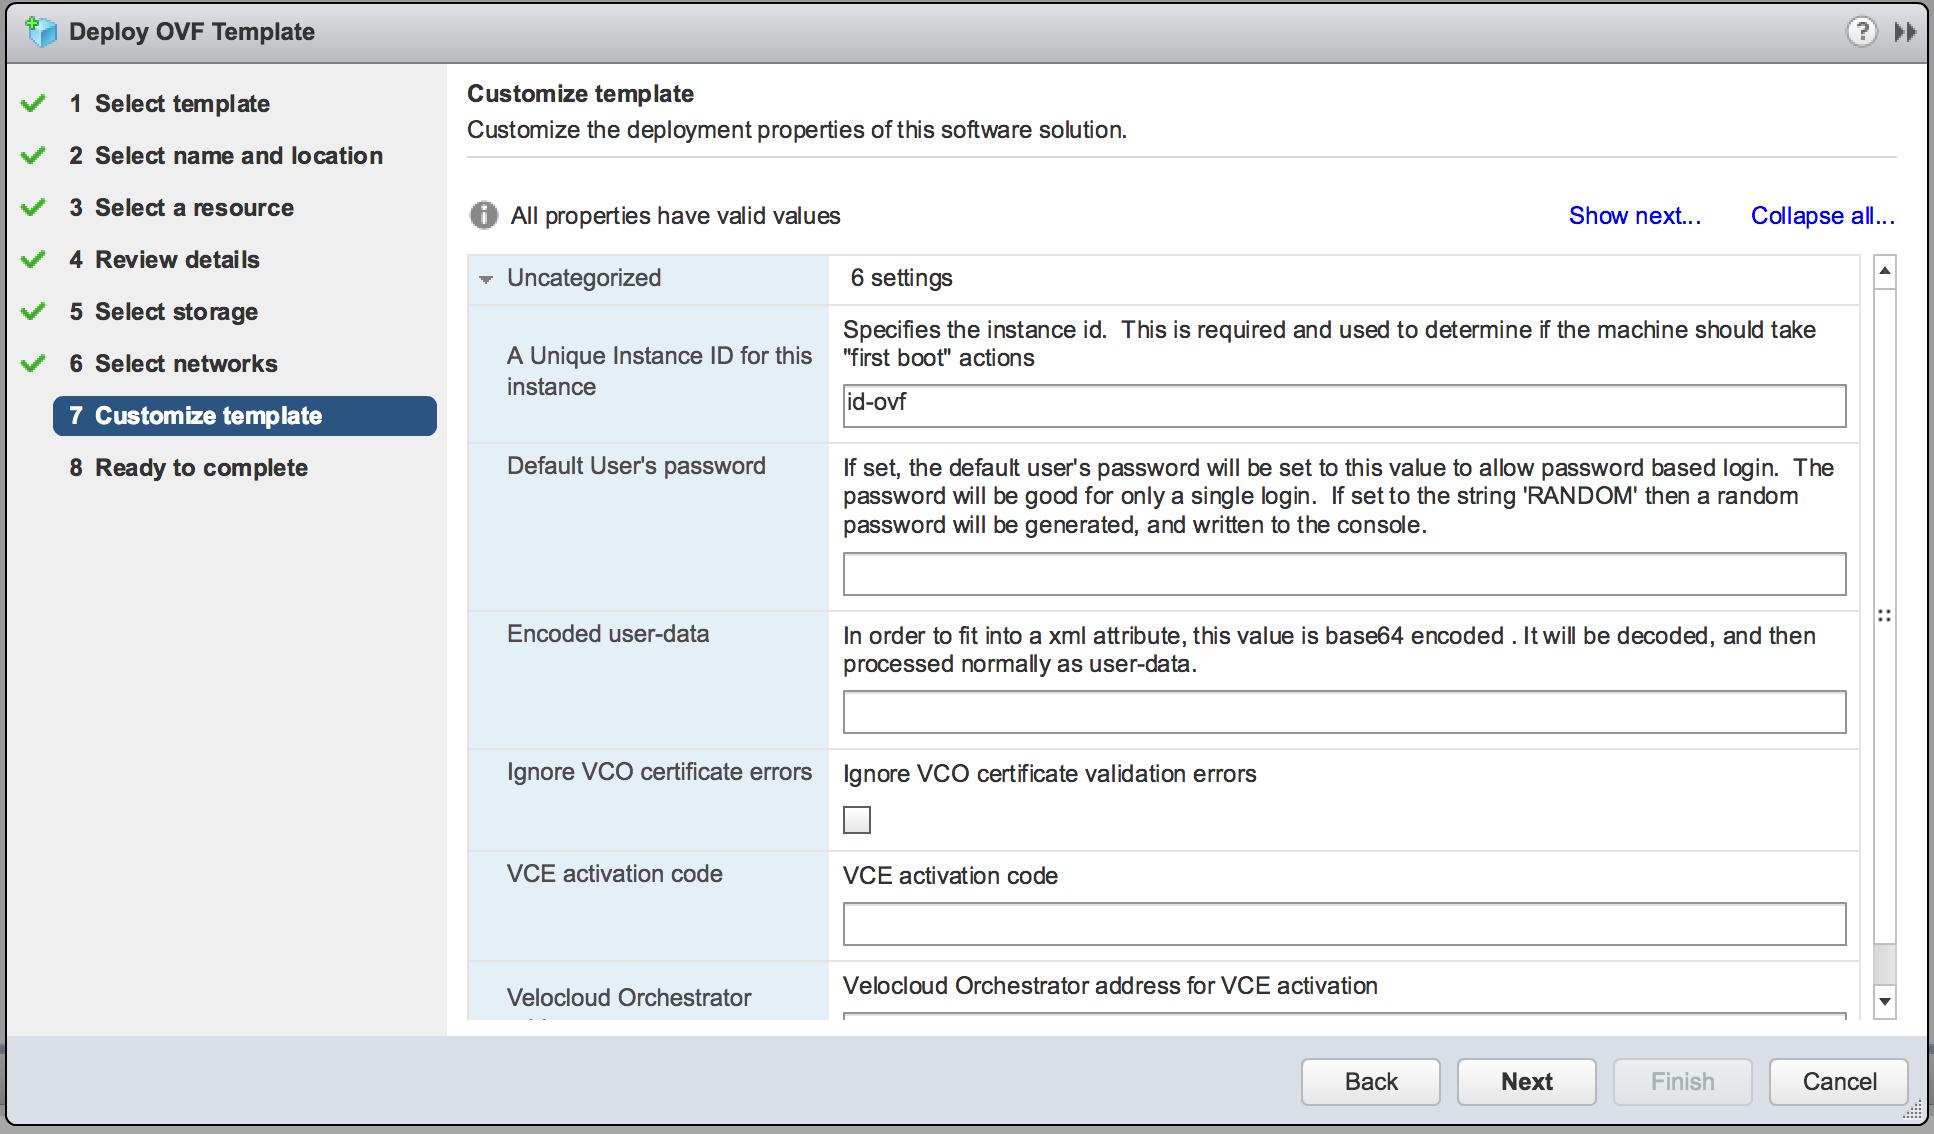 Deploying VeloCloud on VMware vSphere - Lostdomain